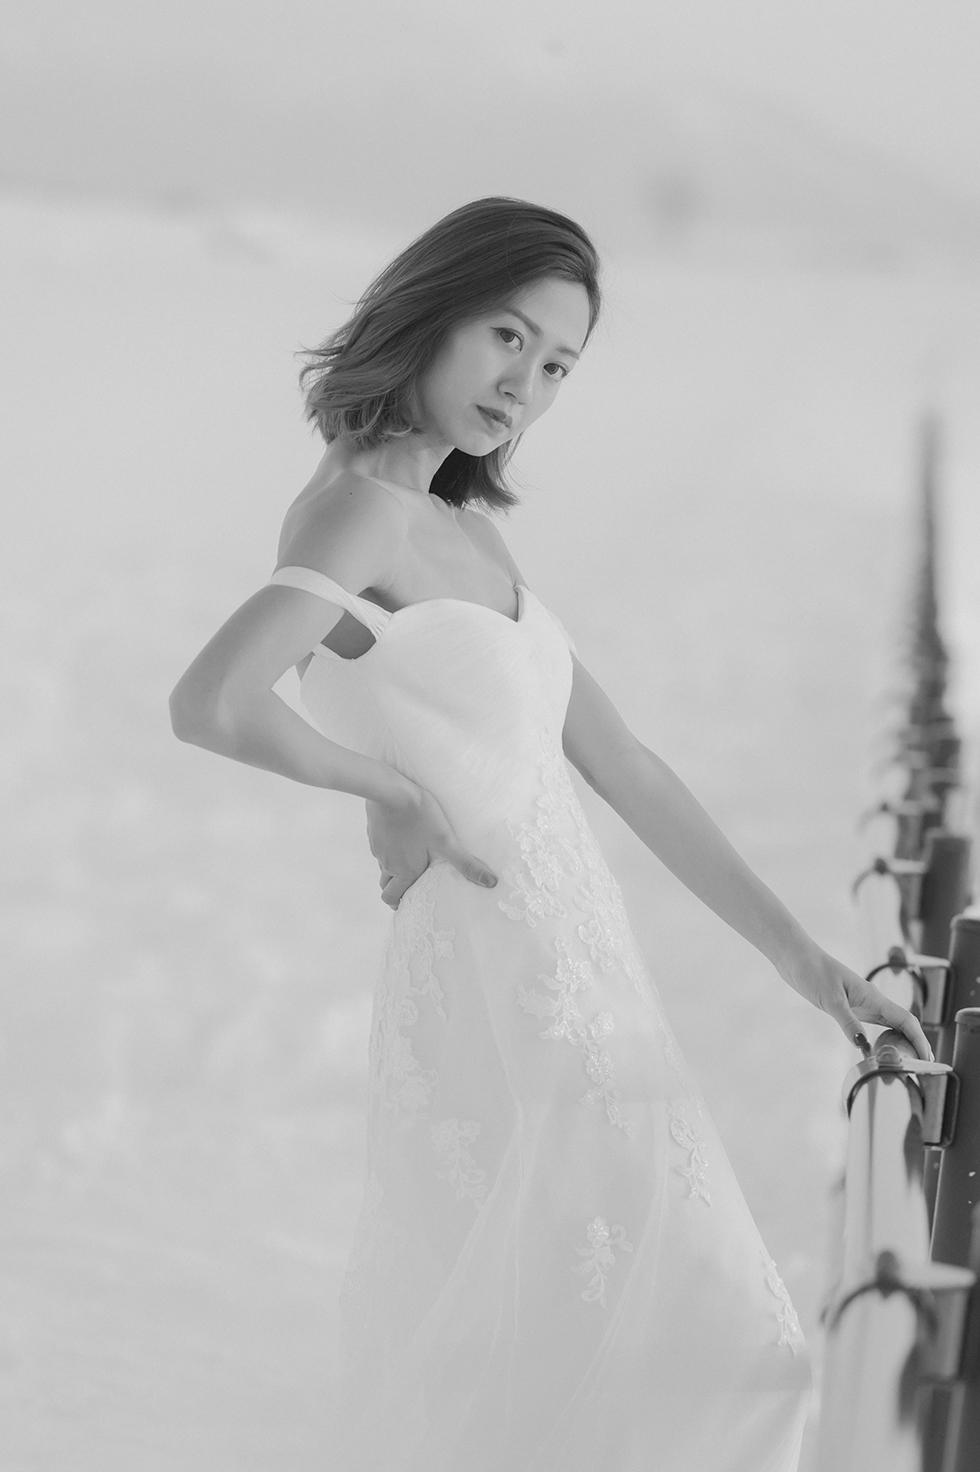 %255BHokkaido%255D%2BGUI076- 婚攝, 婚禮攝影, 婚紗包套, 婚禮紀錄, 親子寫真, 美式婚紗攝影, 自助婚紗, 小資婚紗, 婚攝推薦, 家庭寫真, 孕婦寫真, 顏氏牧場婚攝, 林酒店婚攝, 萊特薇庭婚攝, 婚攝推薦, 婚紗婚攝, 婚紗攝影, 婚禮攝影推薦, 自助婚紗